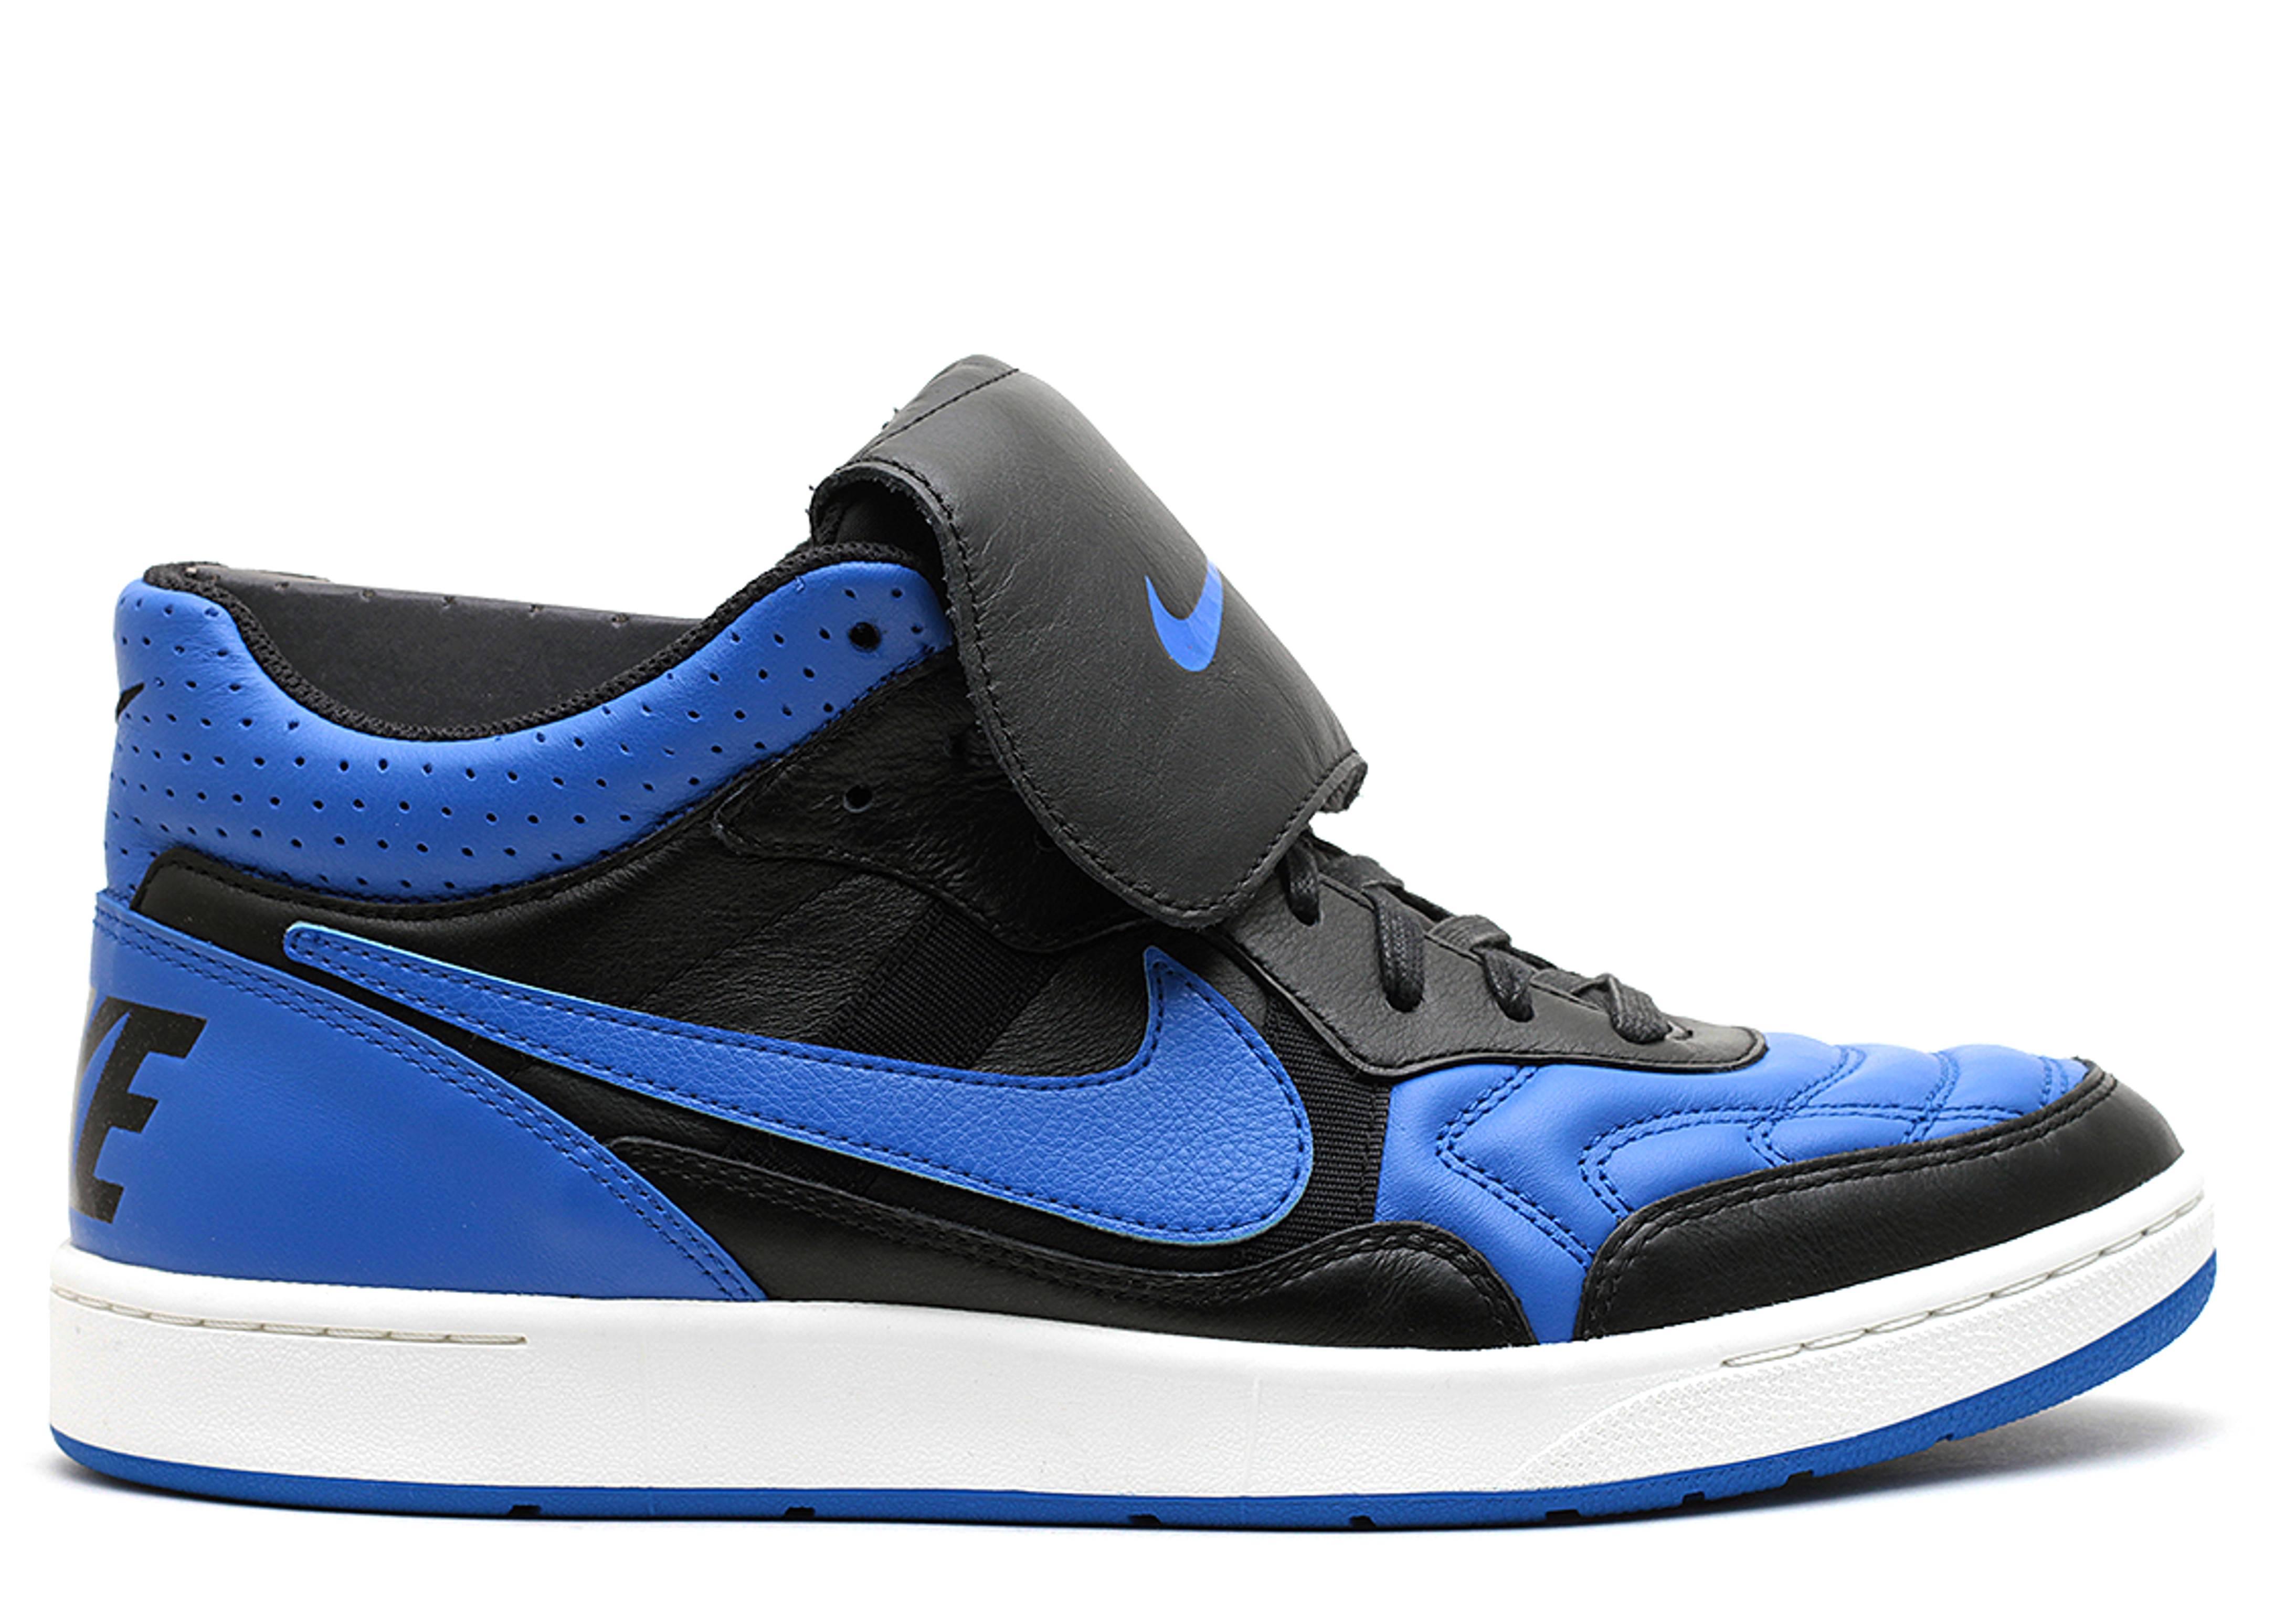 Nike Tiempo 94 Royal Sneakers (Black/Royal Blue-Ivory)